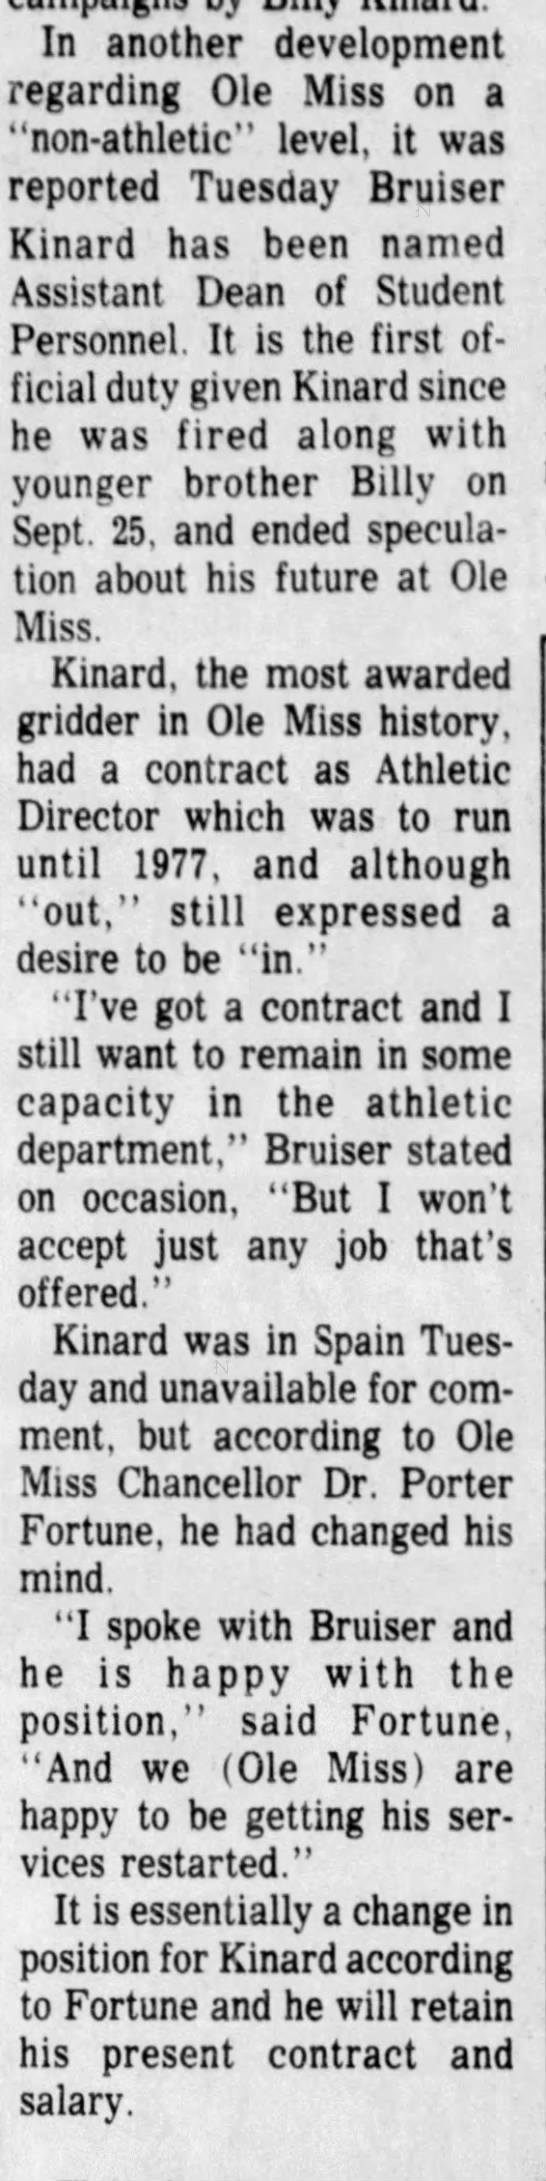 Bruiser Kinard - new position -